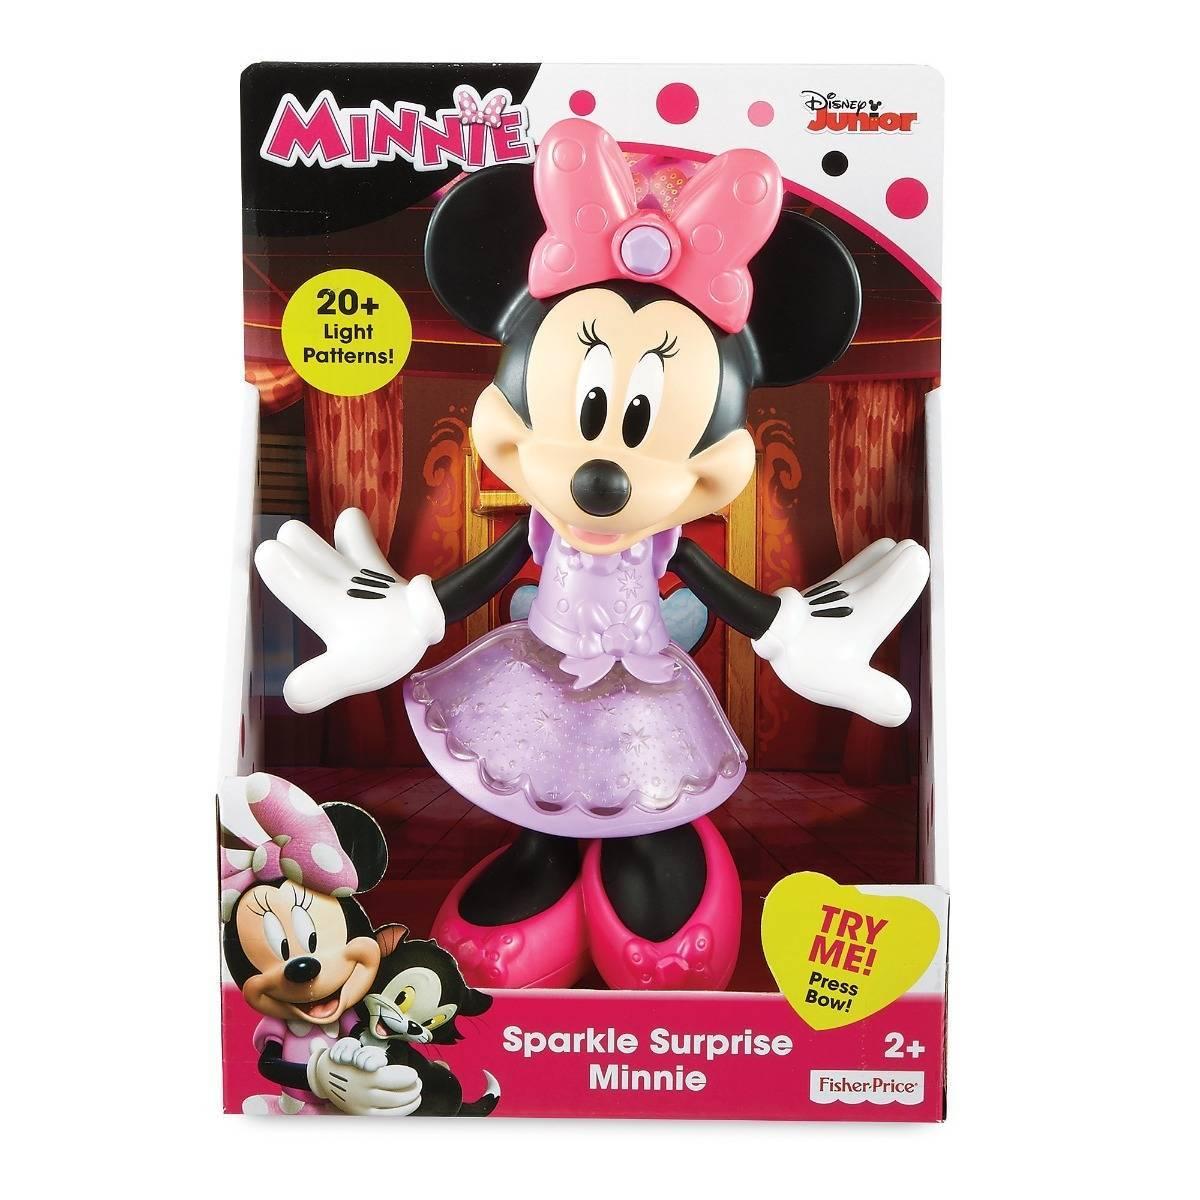 Posar e Brilhar Minnie Mouse Fisher-Price - MattelFJH44 - Noy Brinquedos